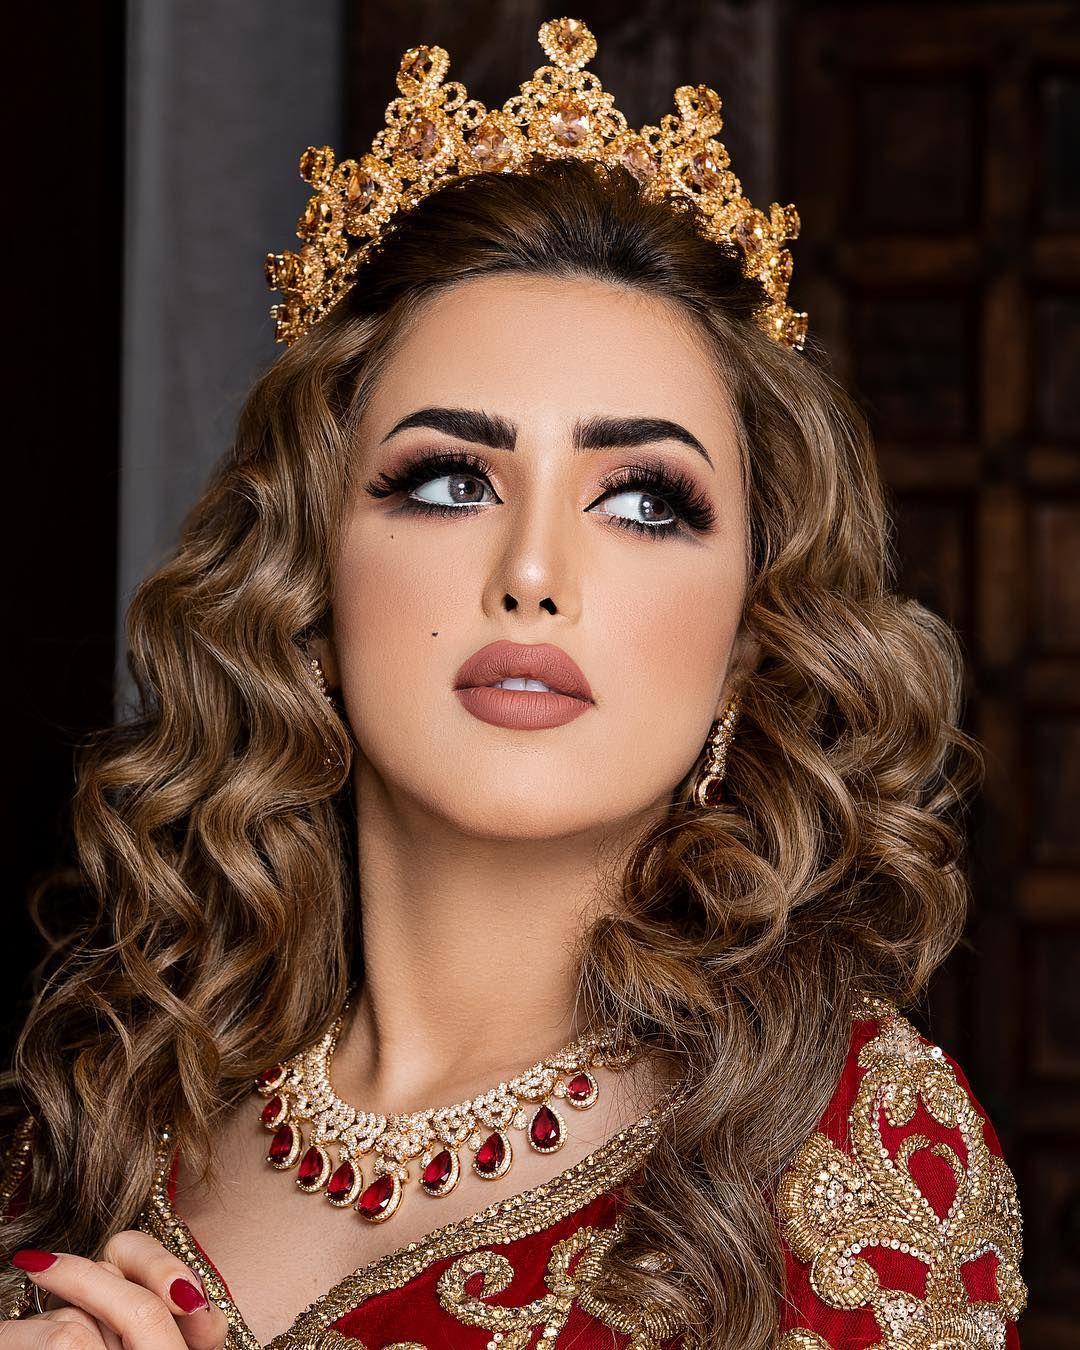 Image May Contain 1 Person Closeup Indian Wedding Hairstyles Bridal Makeup Pakistani Bridal Hairstyles